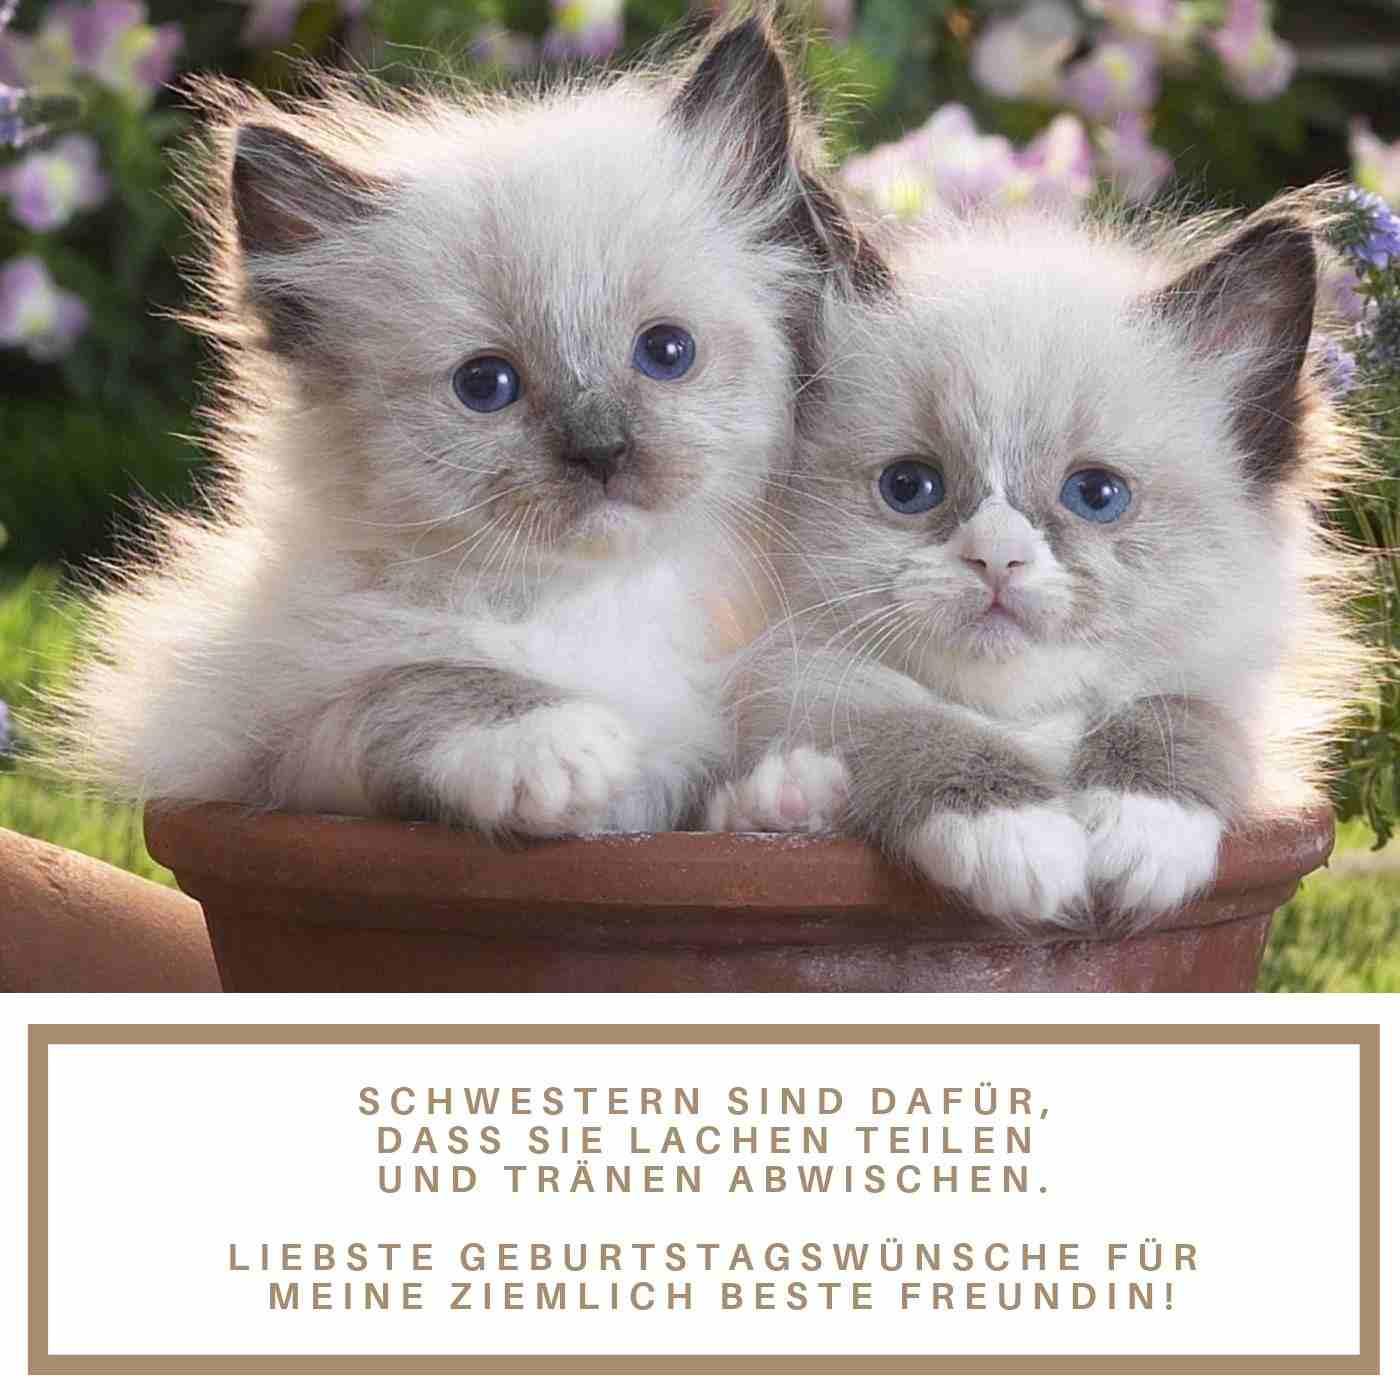 Gluckwunsche Zum Geburtstag Katze Mzia Garsevanishvili